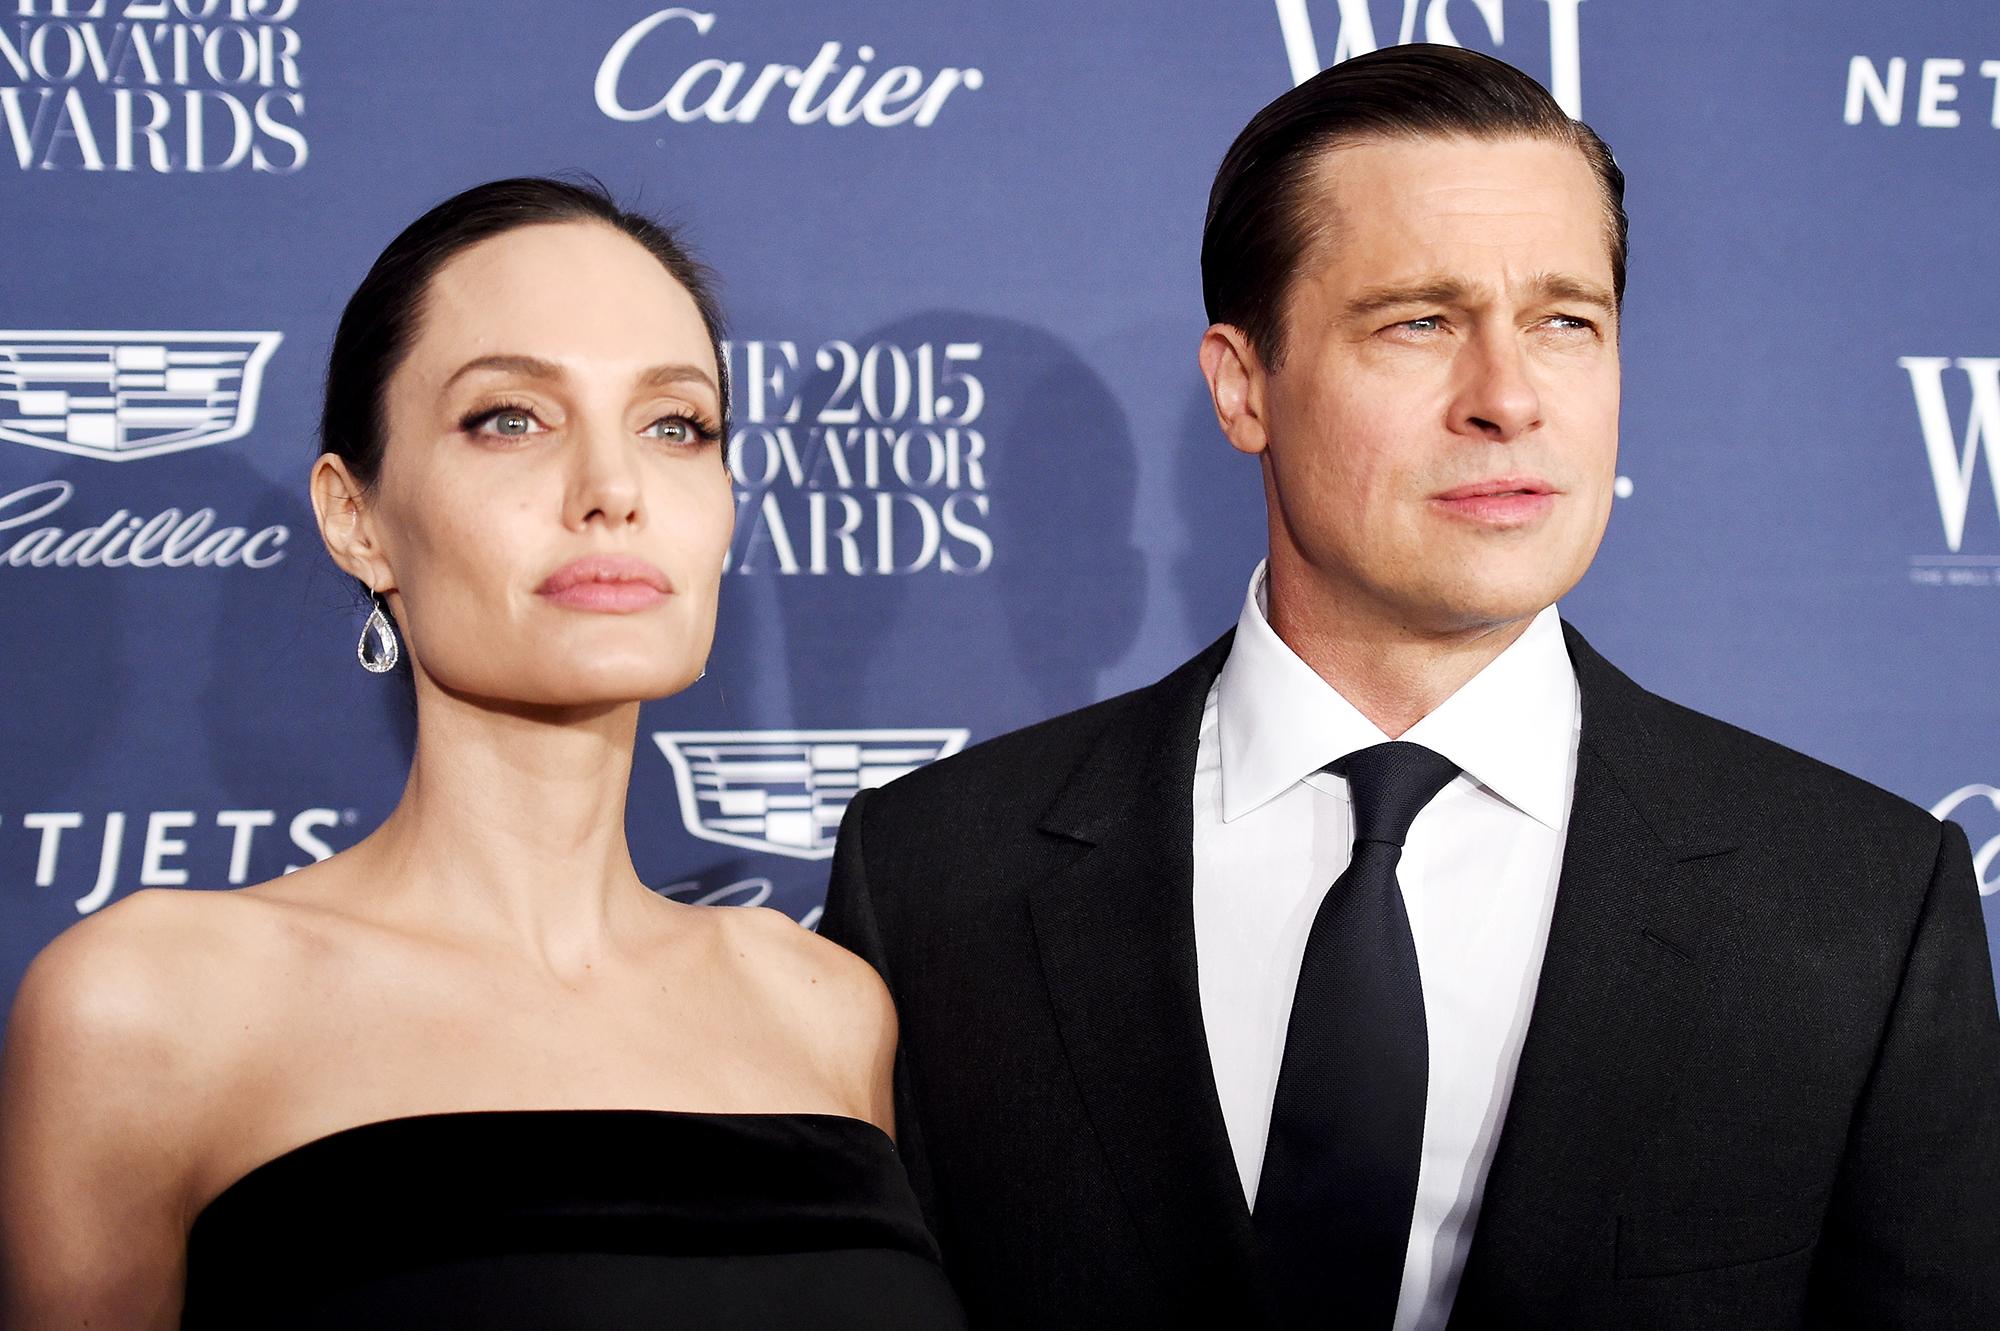 2015 Entertainment Innovator Angelina Jolie-Pitt and Brad Pitt